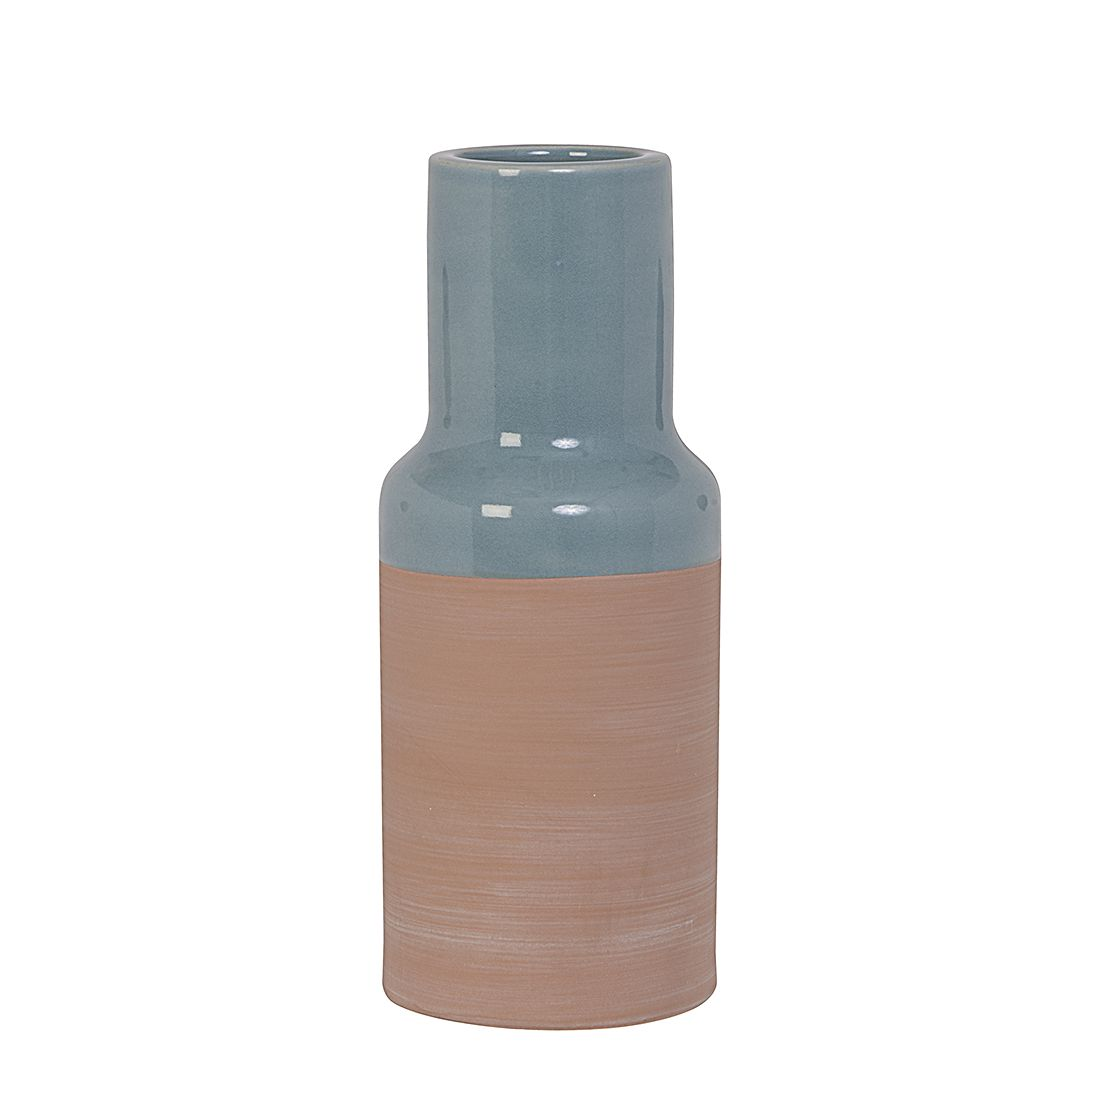 Vase Native – Jeansblau, Present Time jetzt kaufen